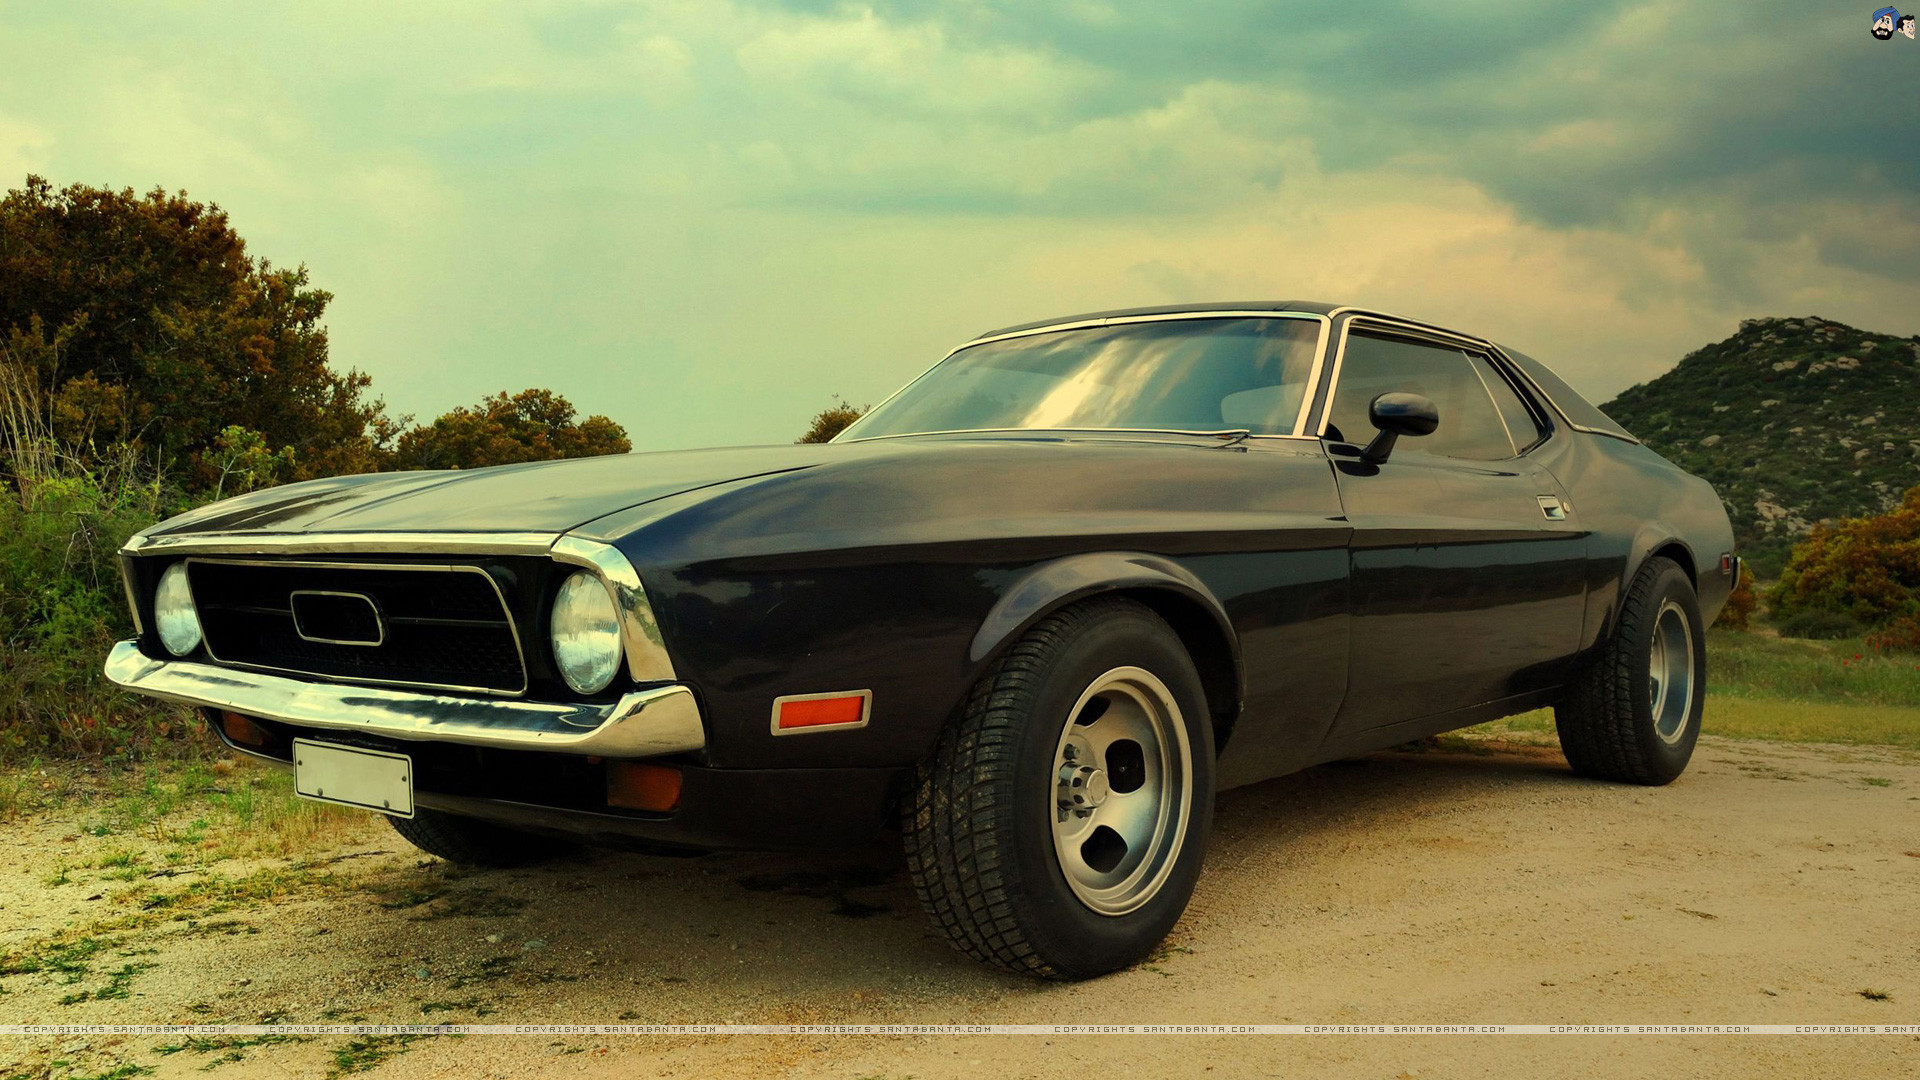 4k Car Wallpaper Mustang Clasic Classic Ford Mustang Wallpaper